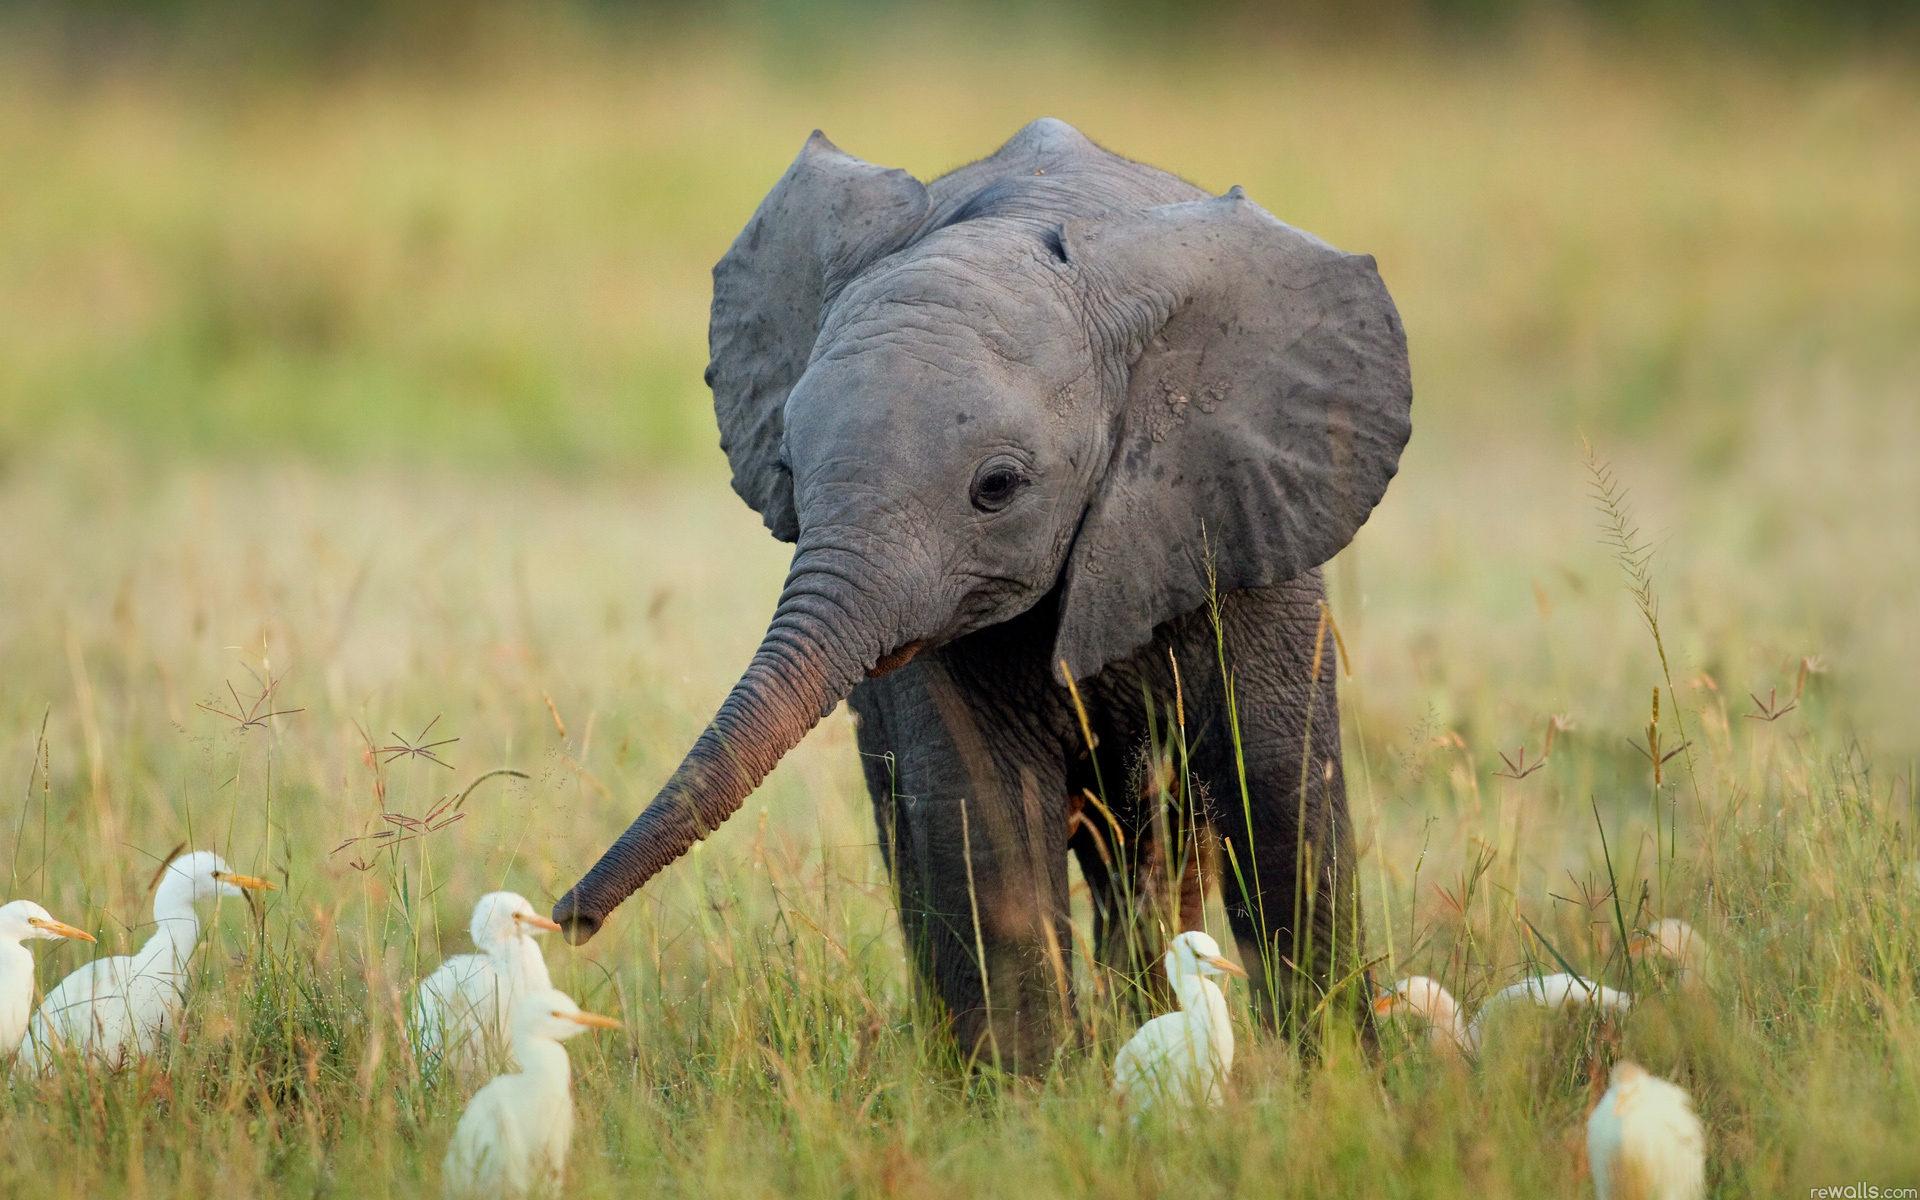 10 best hd elephant wallpapers freecreatives - Baby elephant wallpaper ...